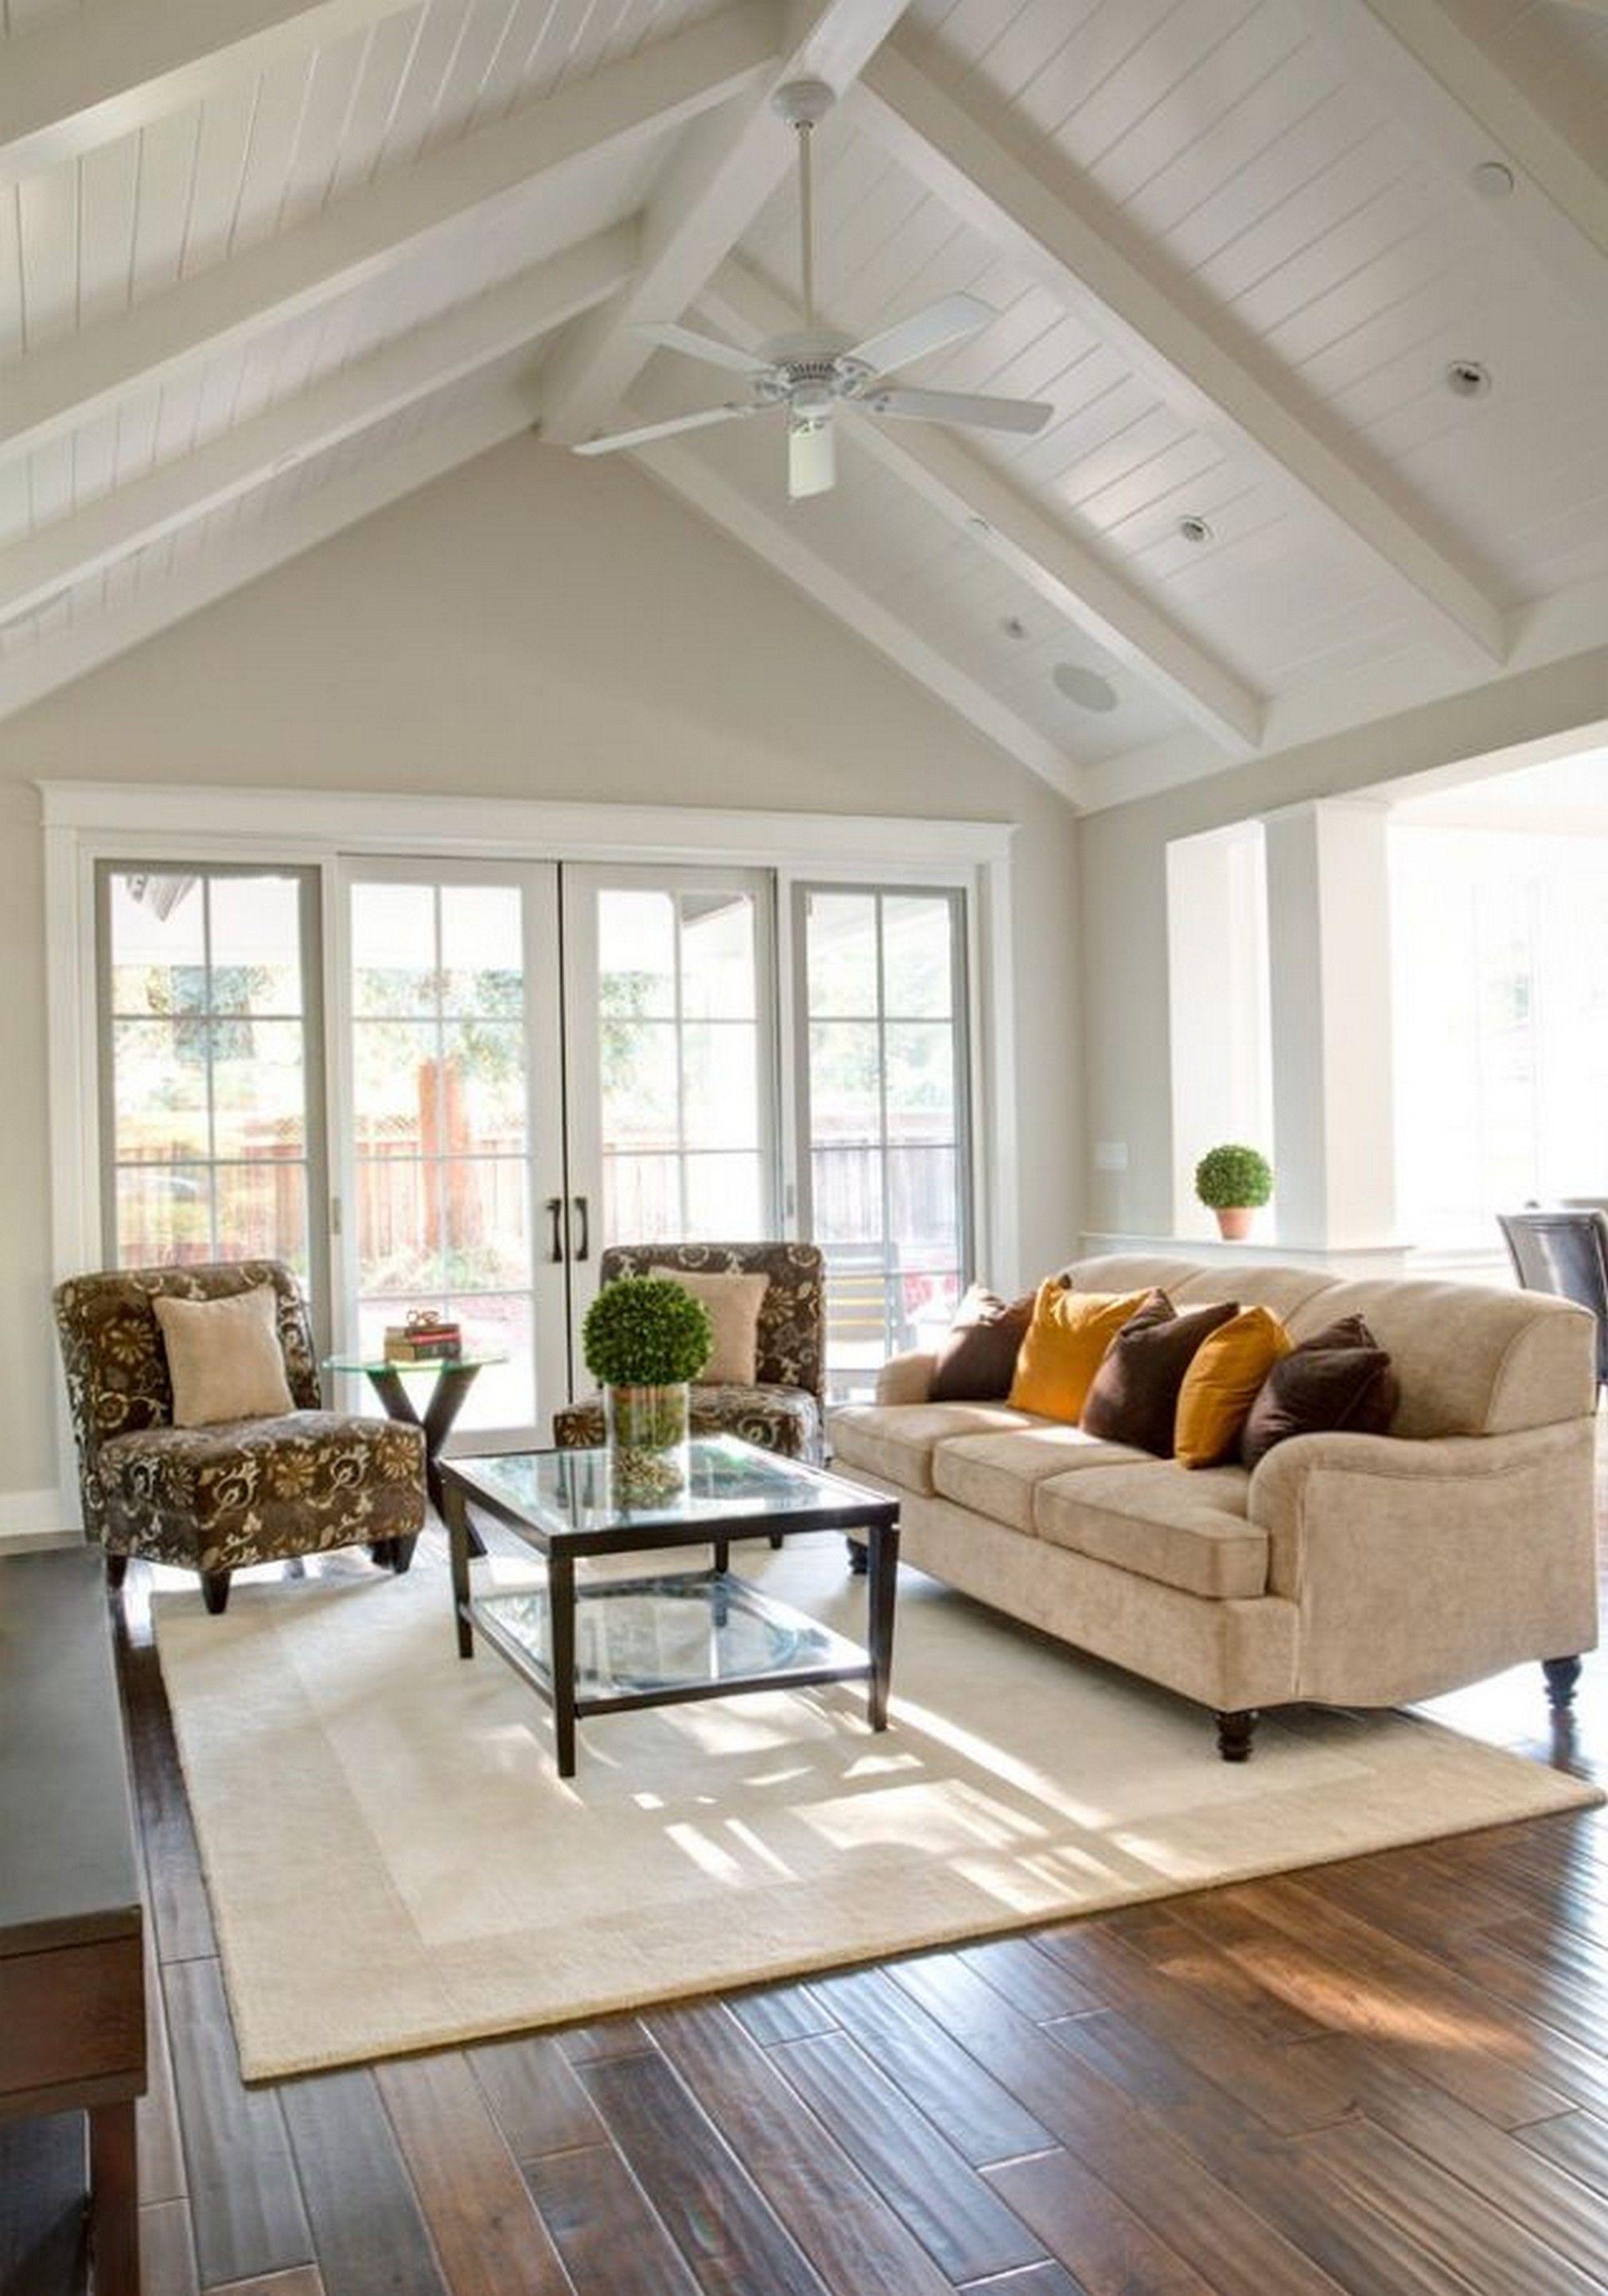 elegant farmhouse decor - Google Search | Traditional ...